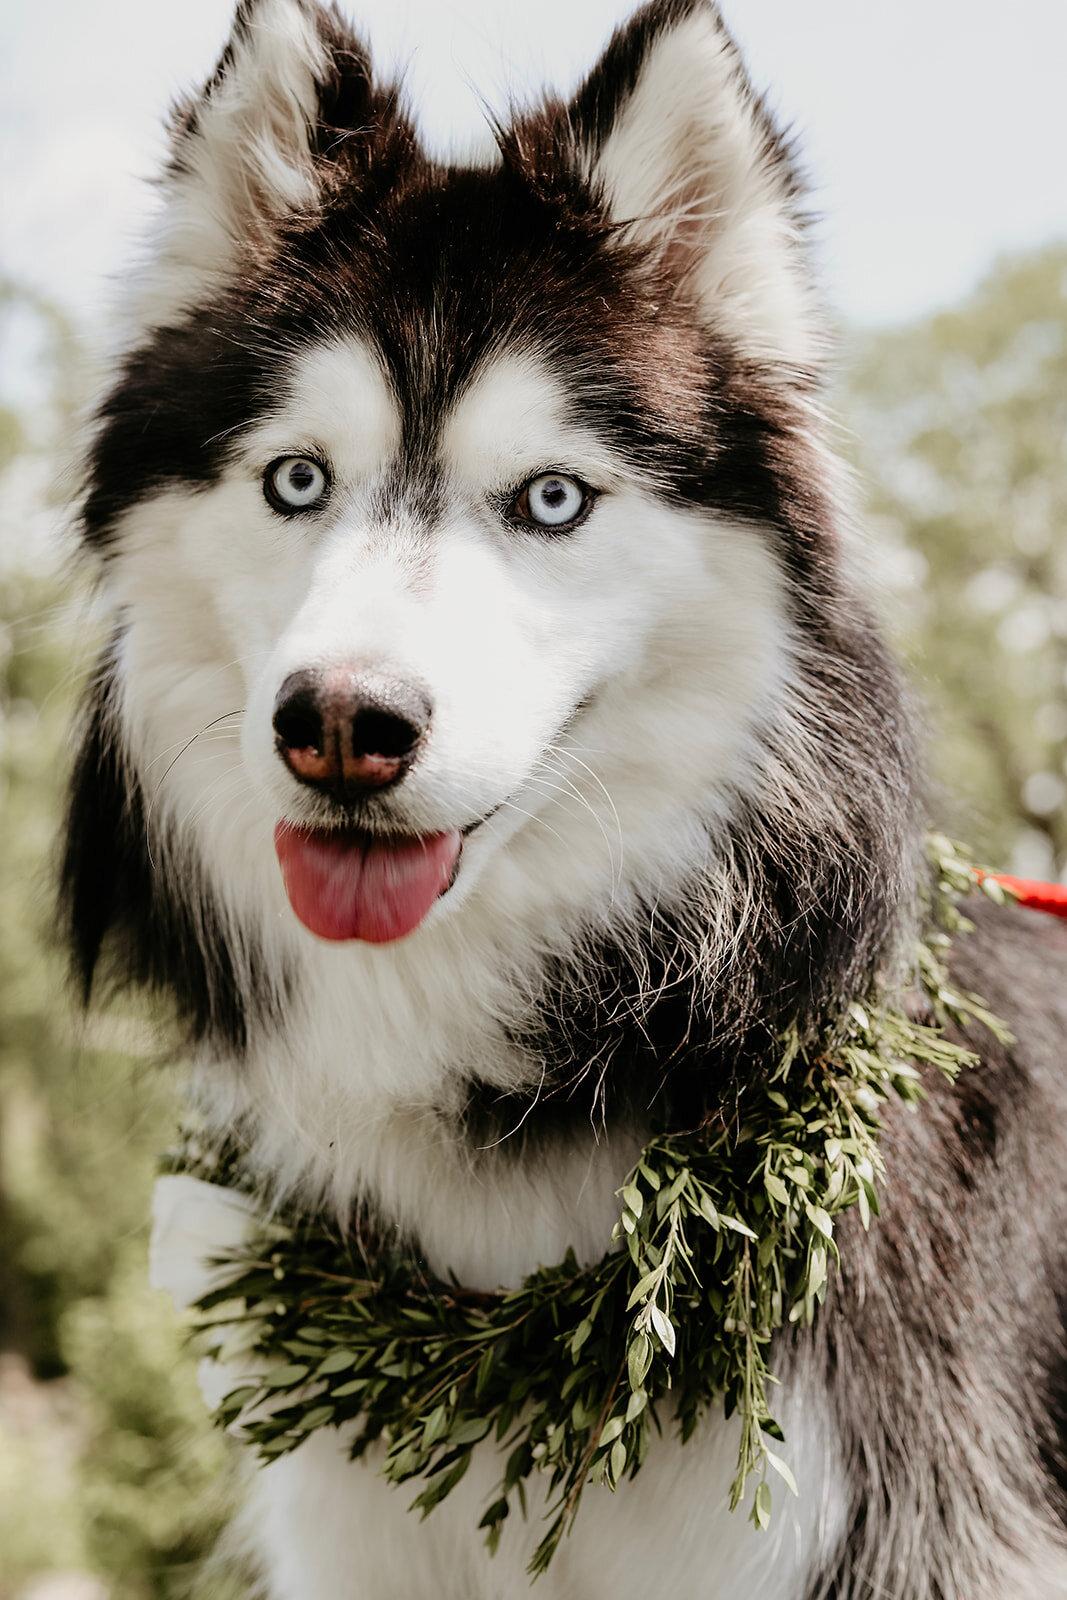 august-wolf-floral-design-huskie-husky-dog-floral-collar-flower-wreath-pup-puppy-greens-florist.jpg